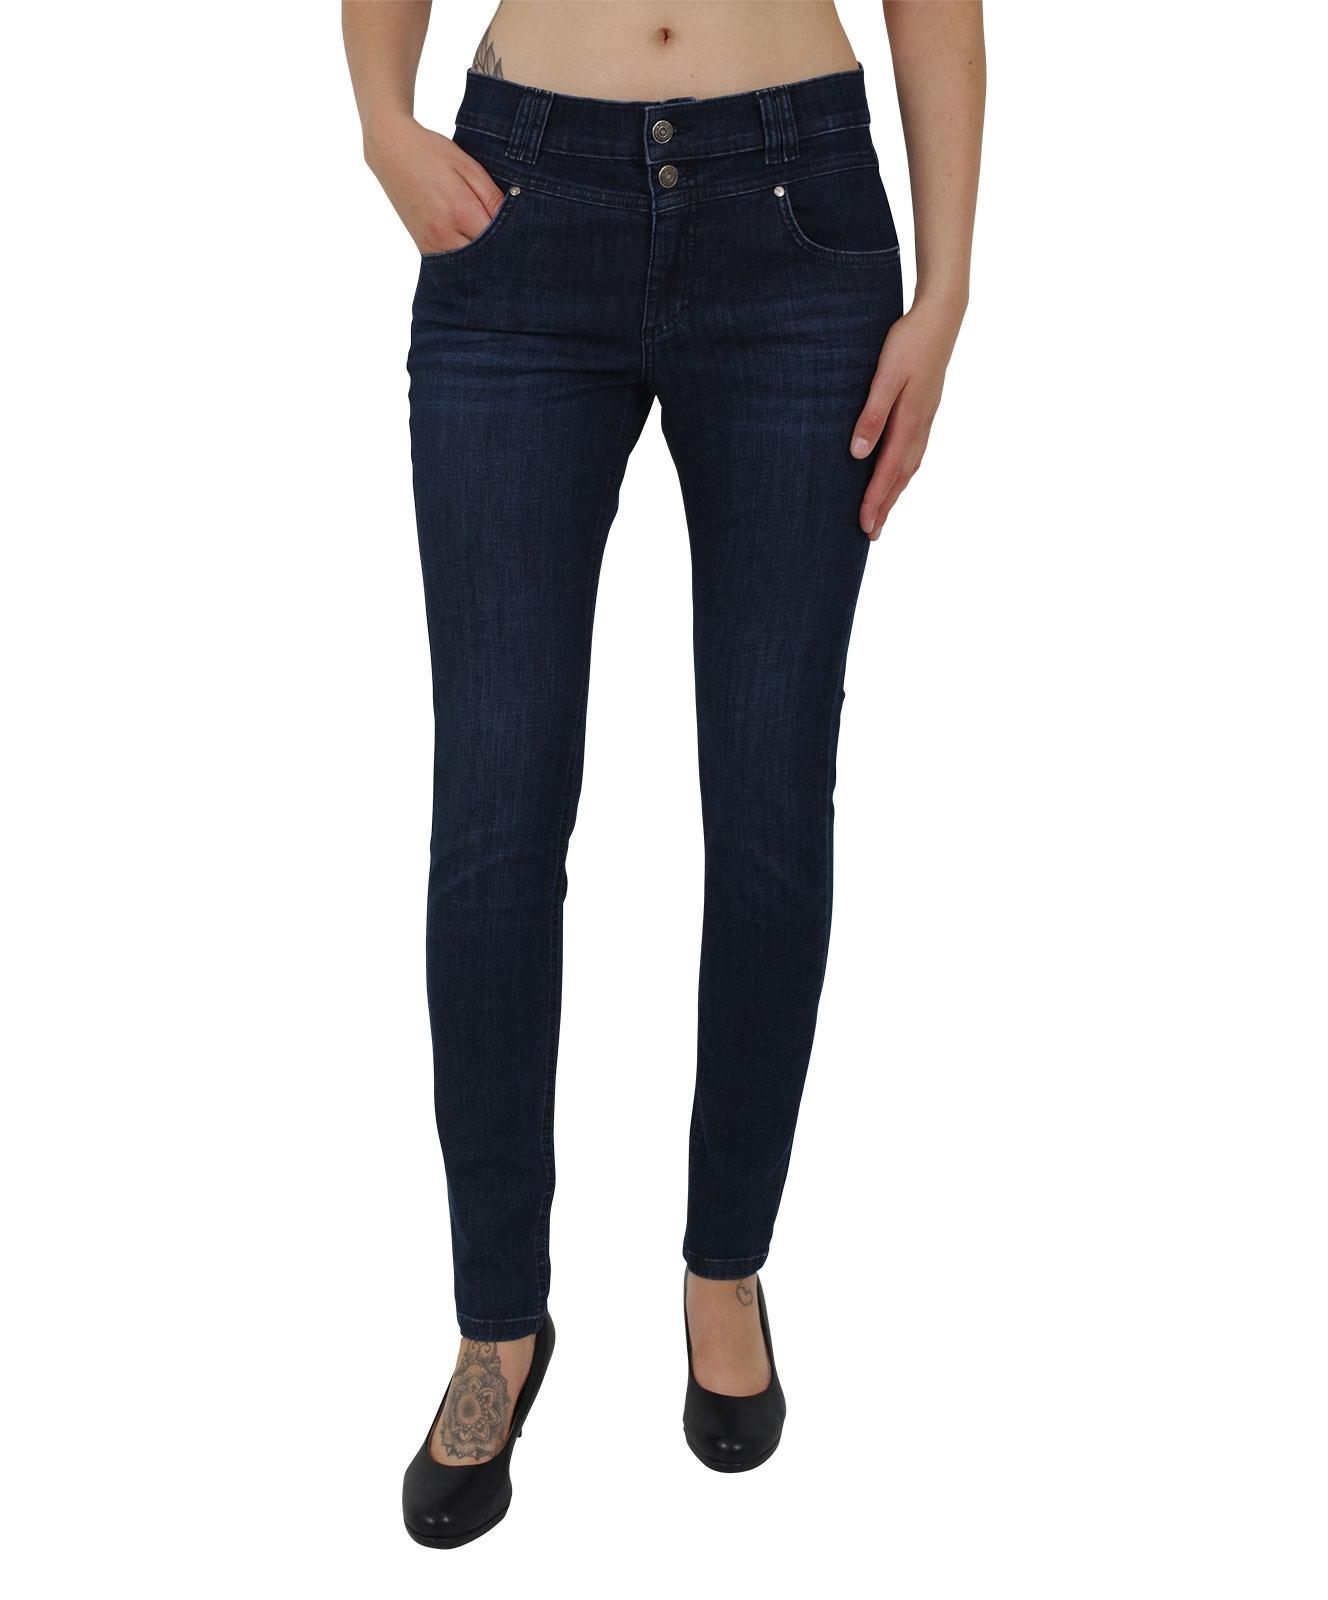 Hosen - Angels Skinny Jeans Skinny Button in Dark Indigo Used Buffi  - Onlineshop Jeans Meile